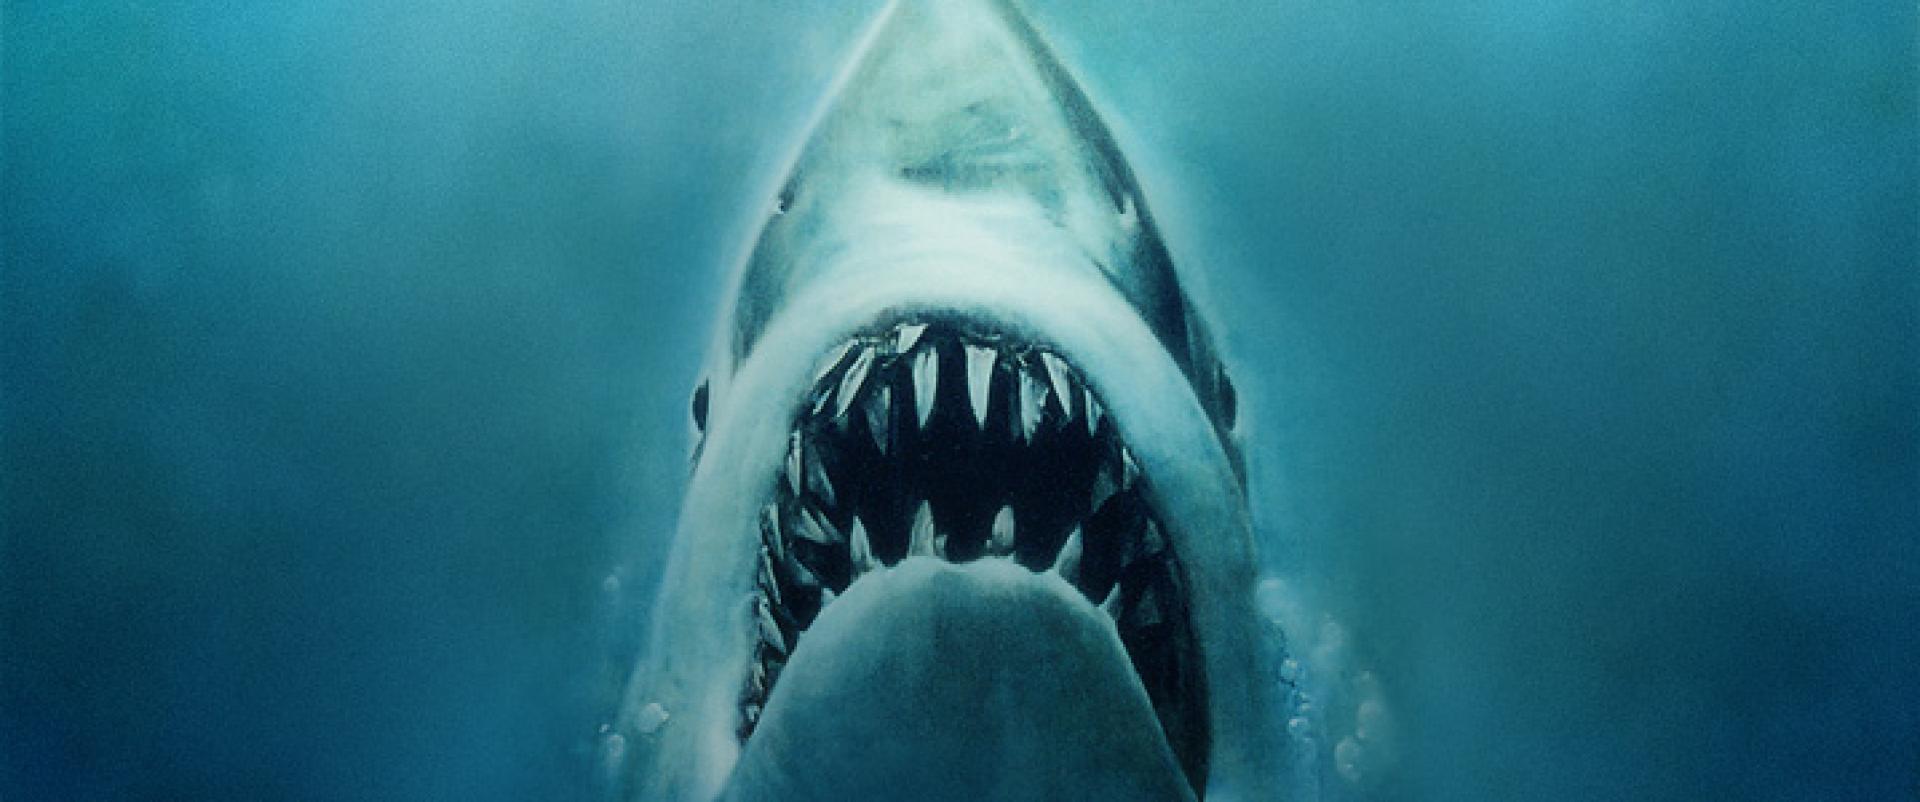 Jaws 1-4 - Cápa 1-4 (1975/1978/1983/1987)